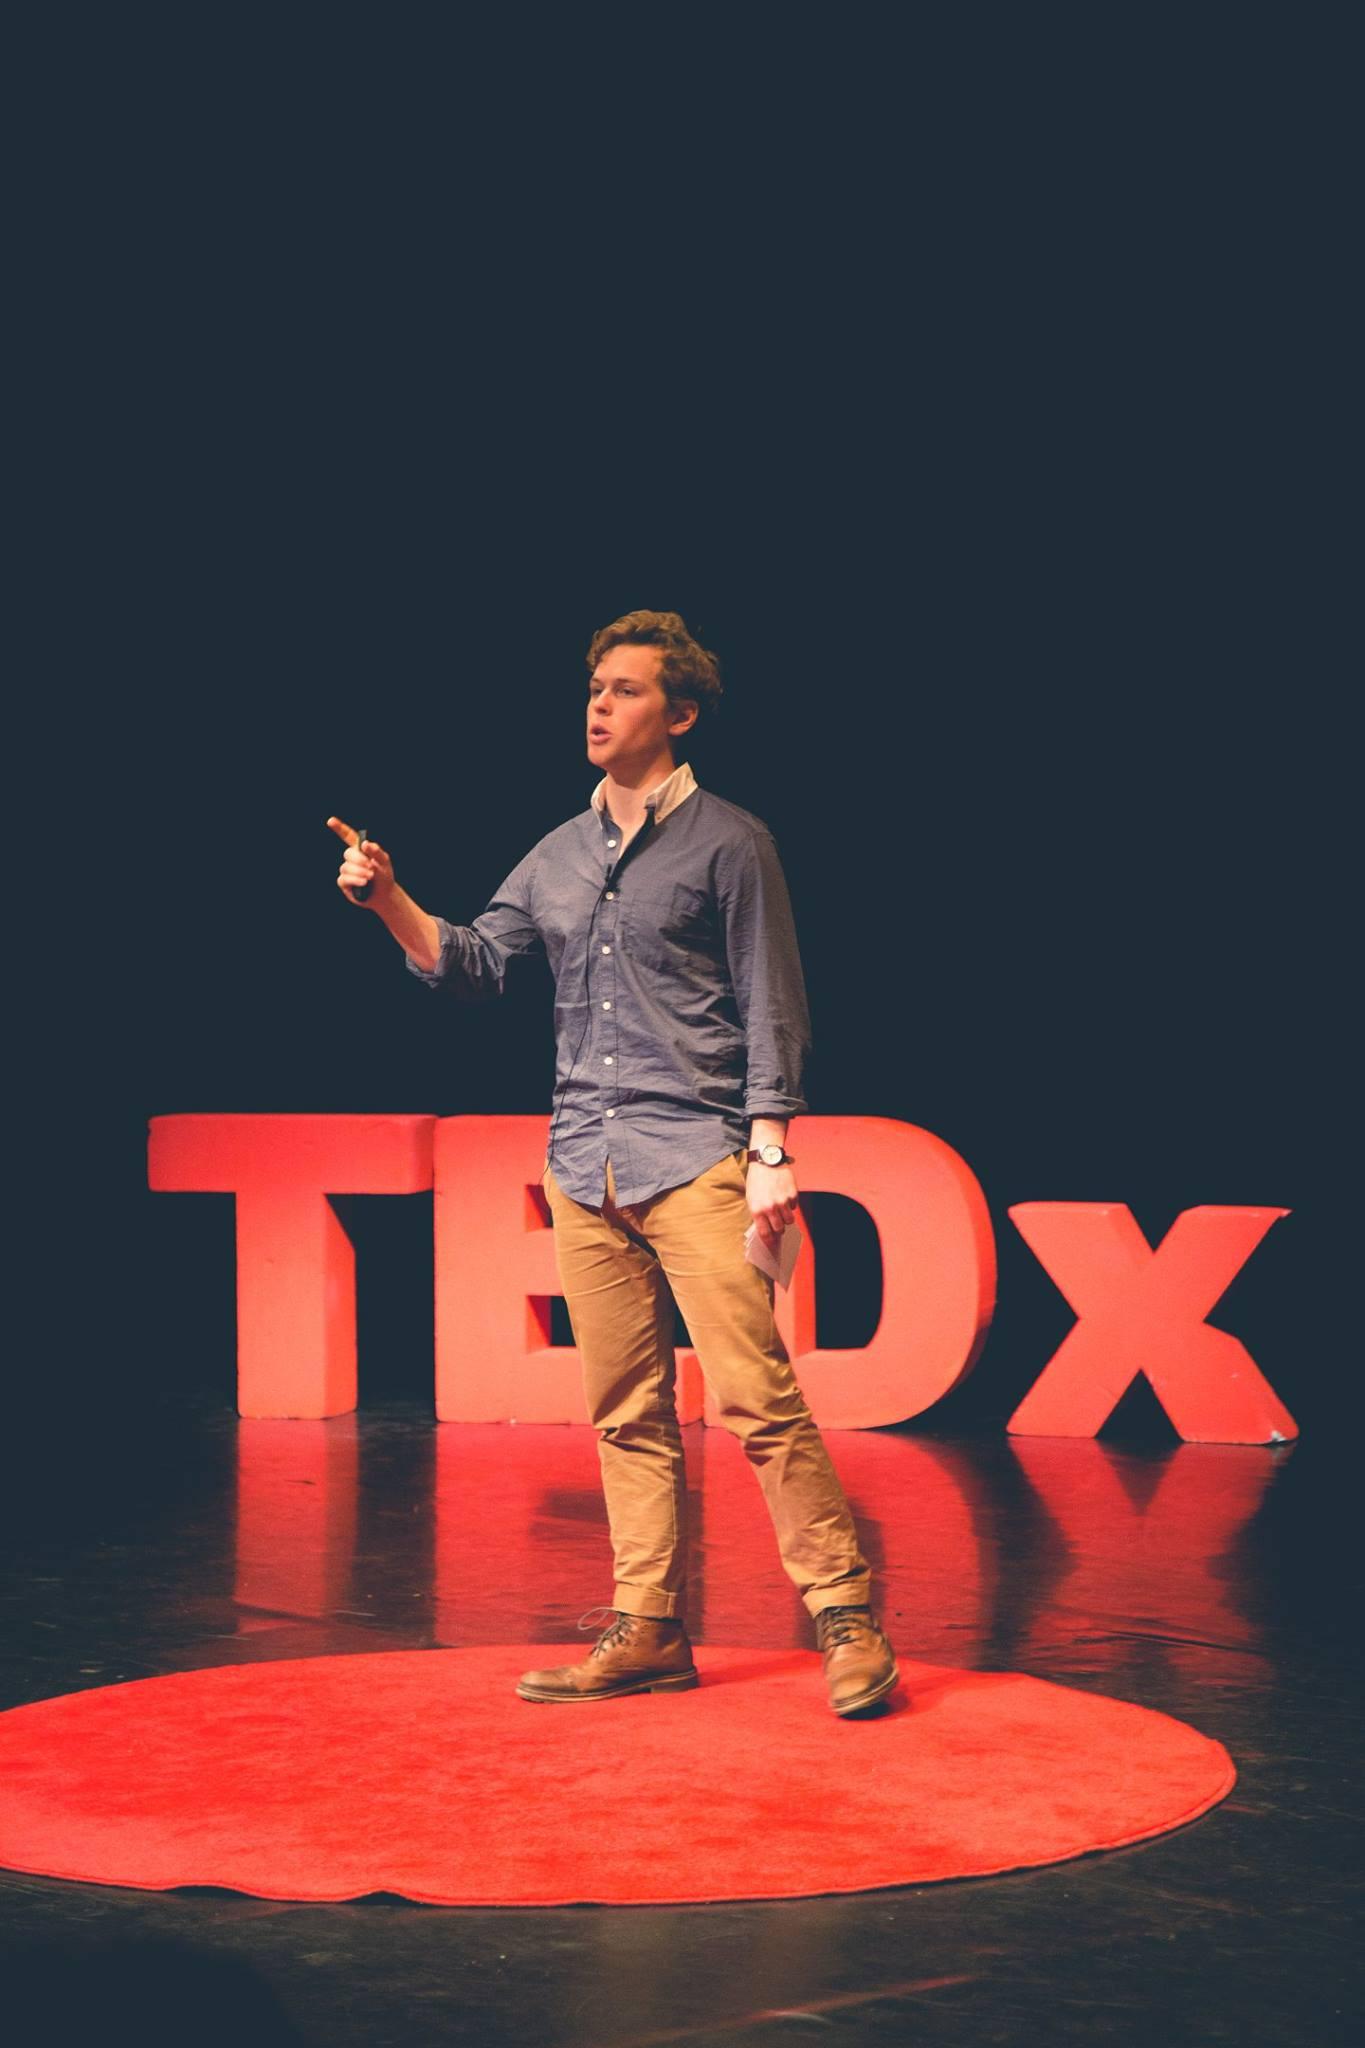 Photo from Tedx 2.jpg